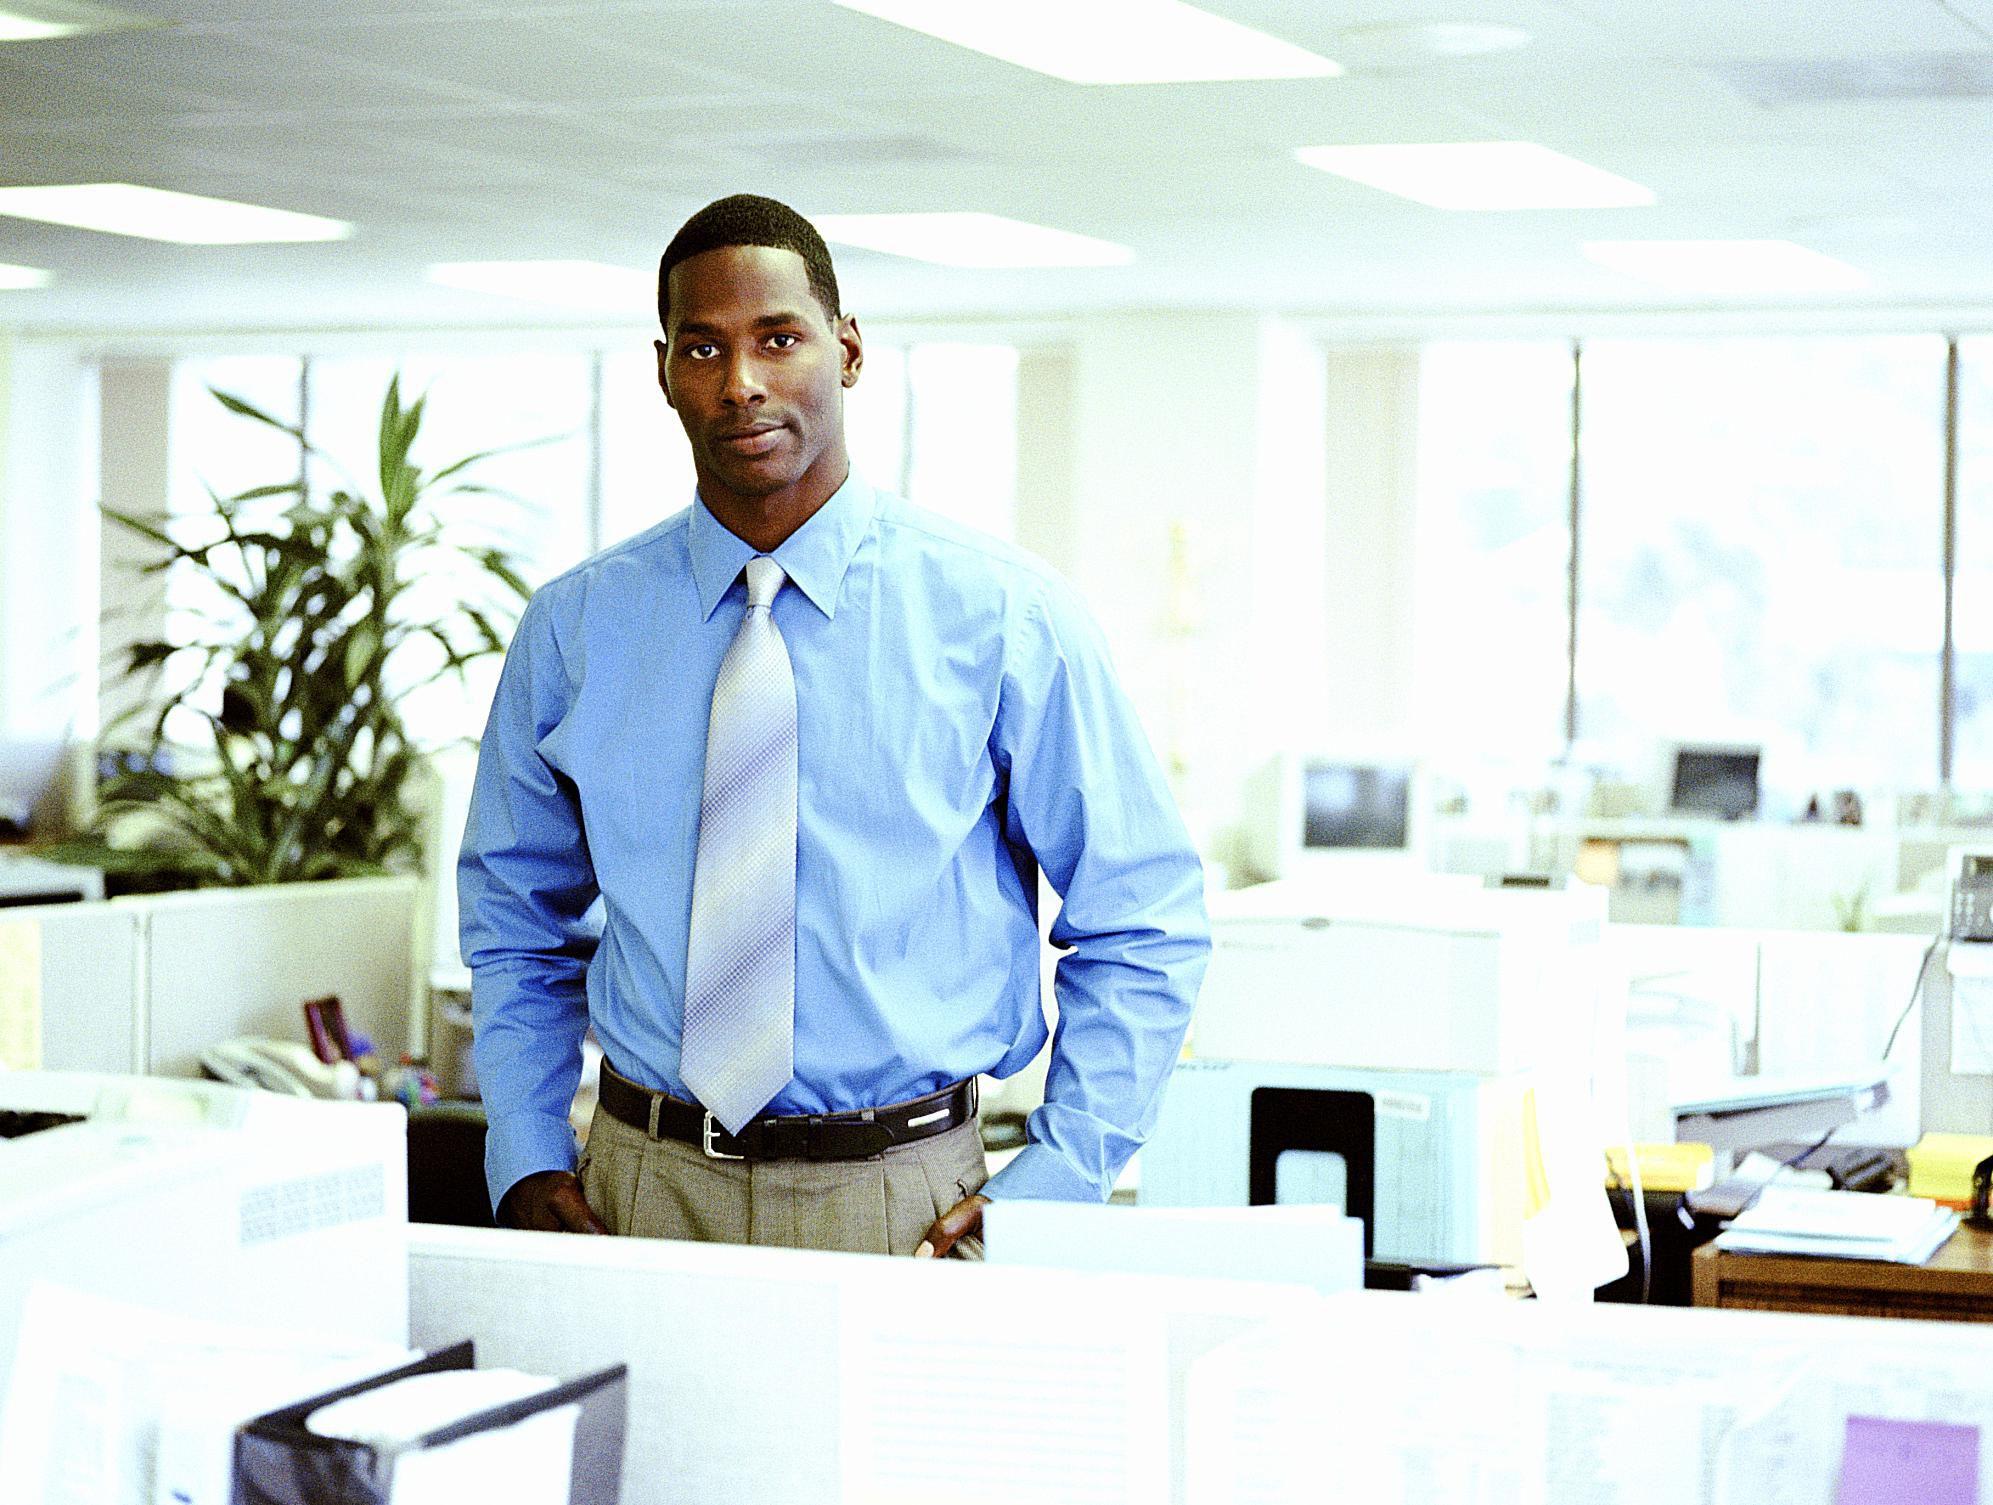 Human Resources Manager Job Description and Salary